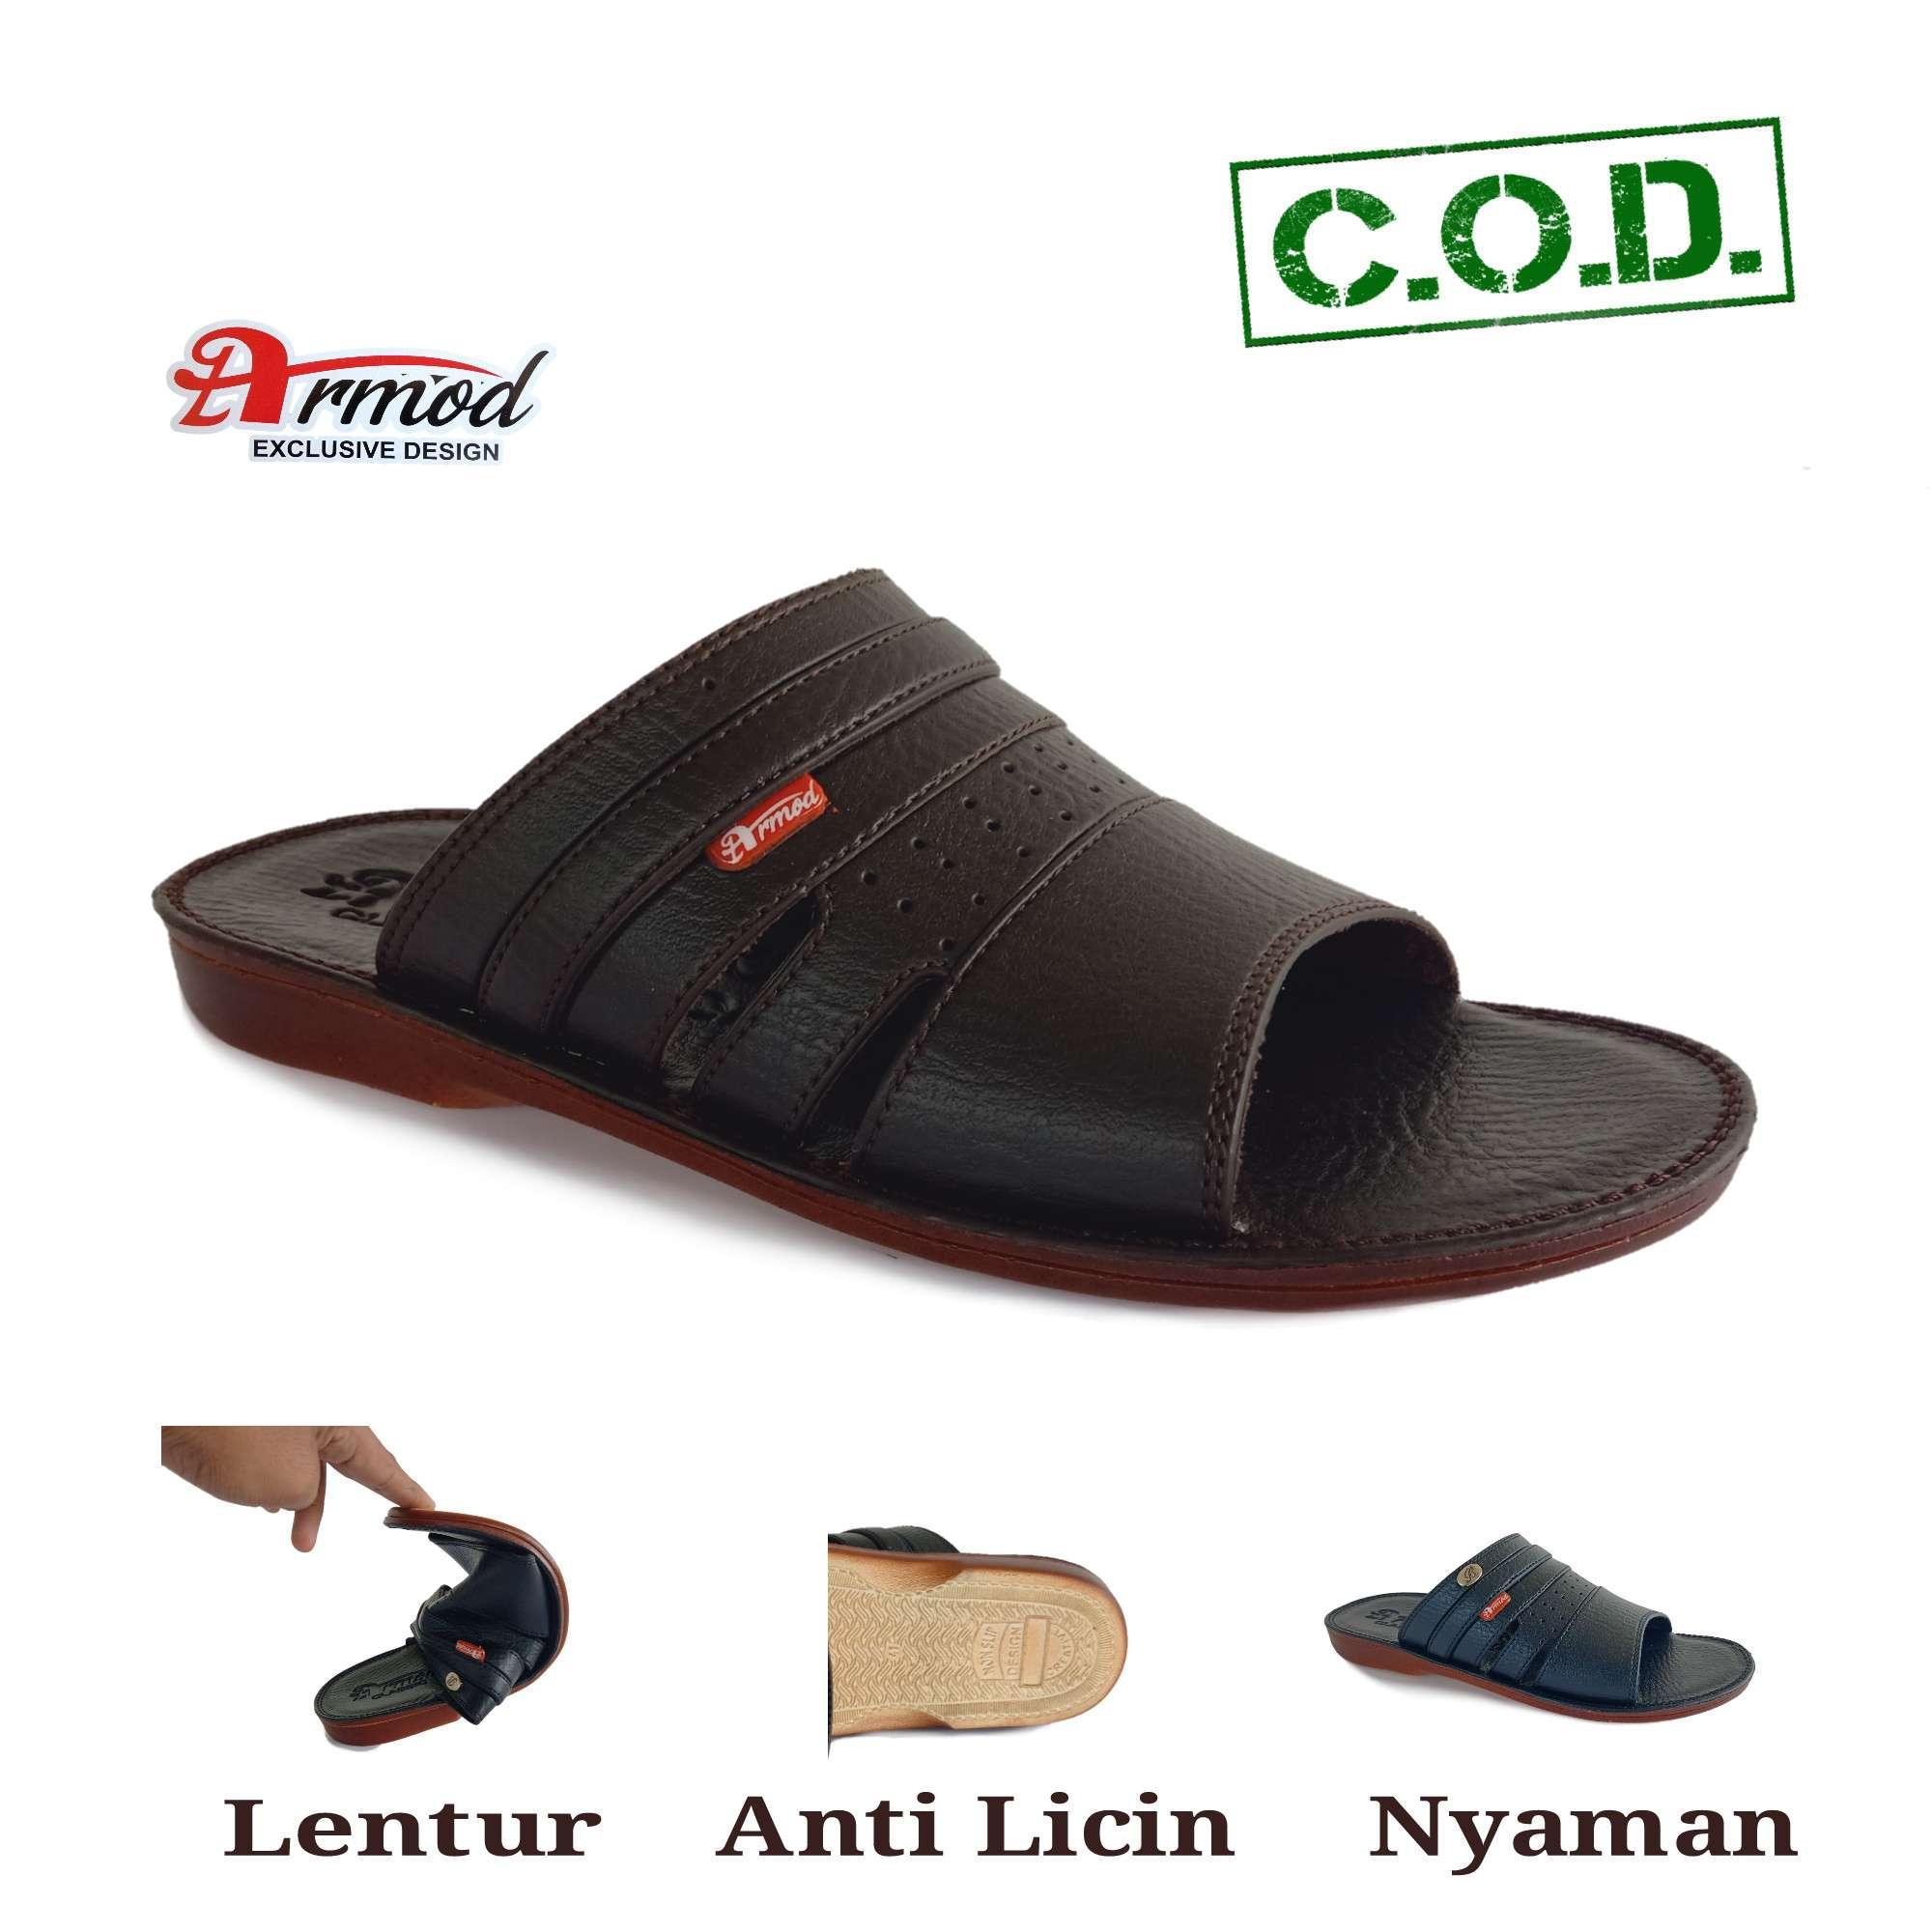 sandal kulit pria / sandal pria kulit casual / sandal pria casual kulit / sandal pria kulit / sandal pria kulit  / armod sbr 053 b